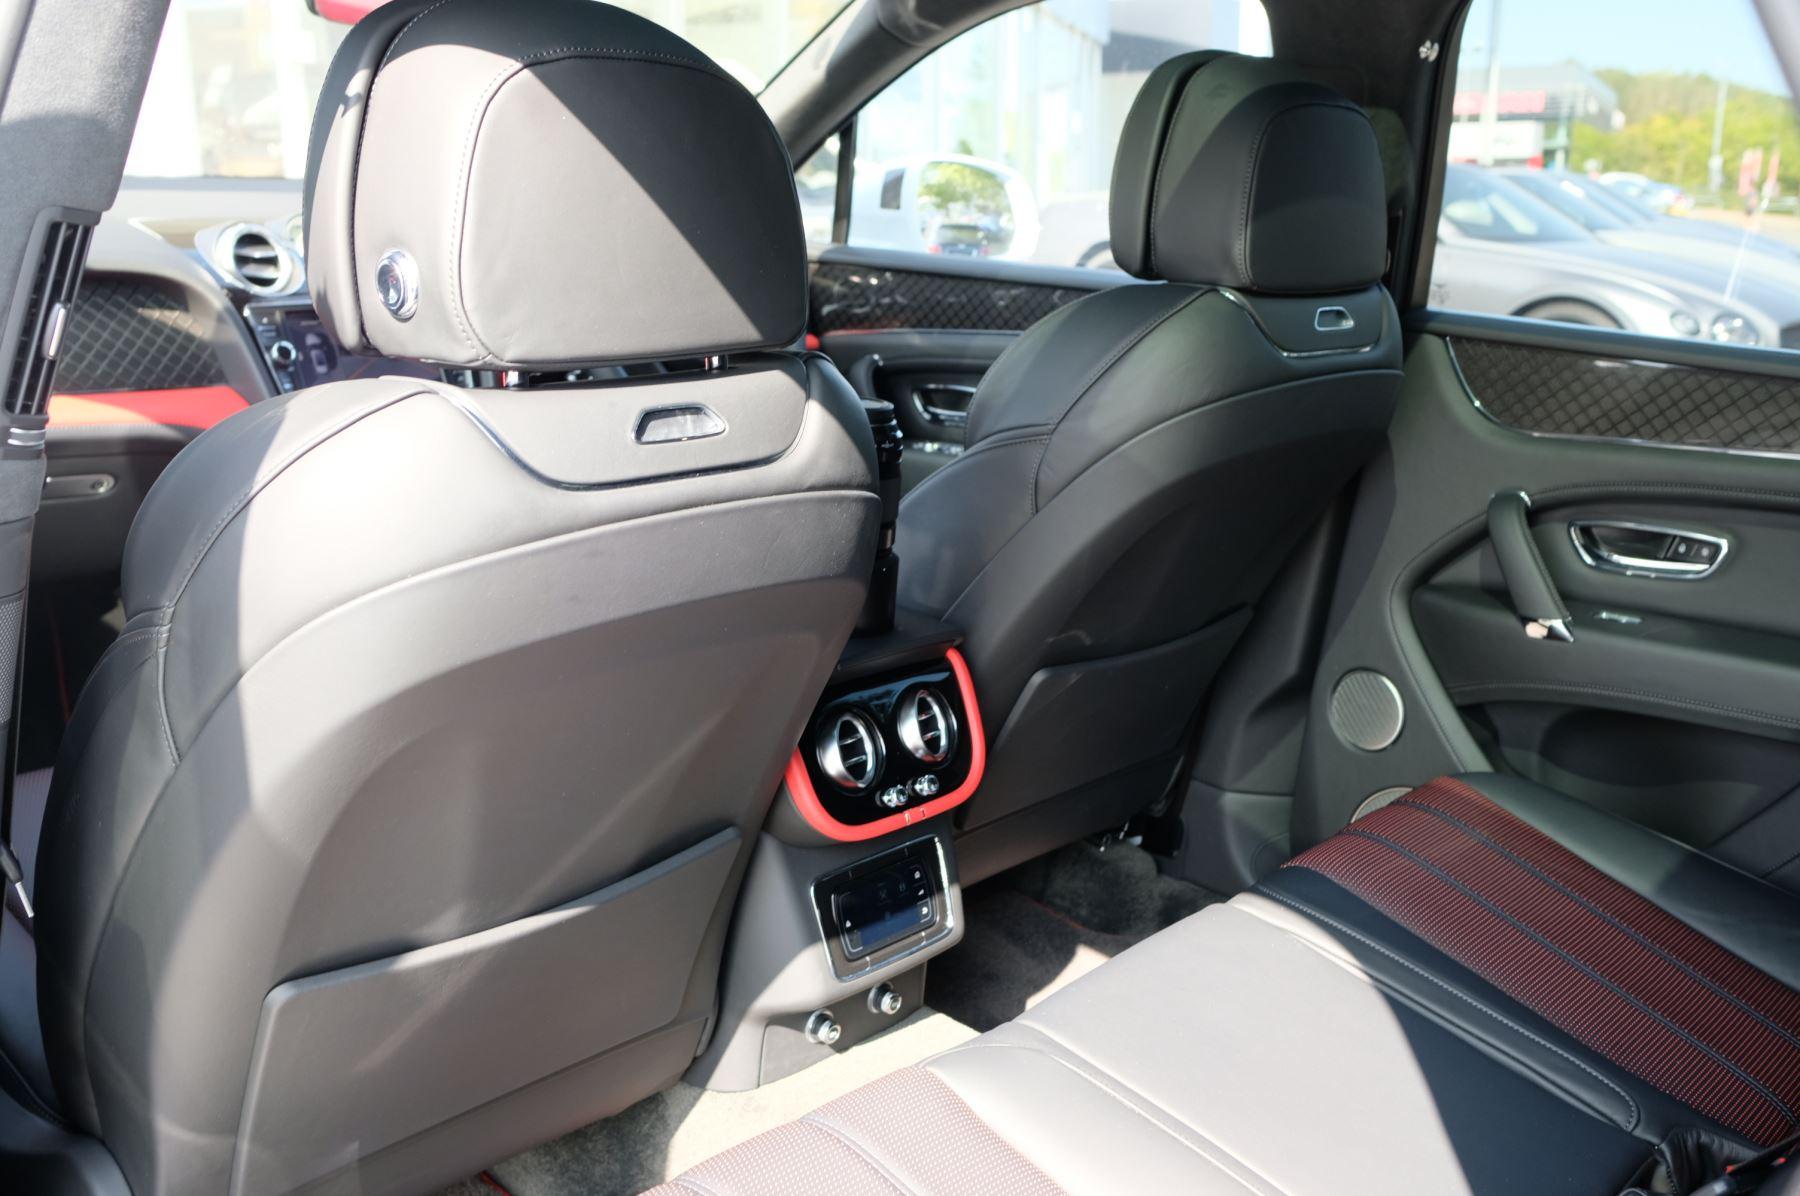 Bentley Bentayga V8 4.0 Design Series 5dr image 14